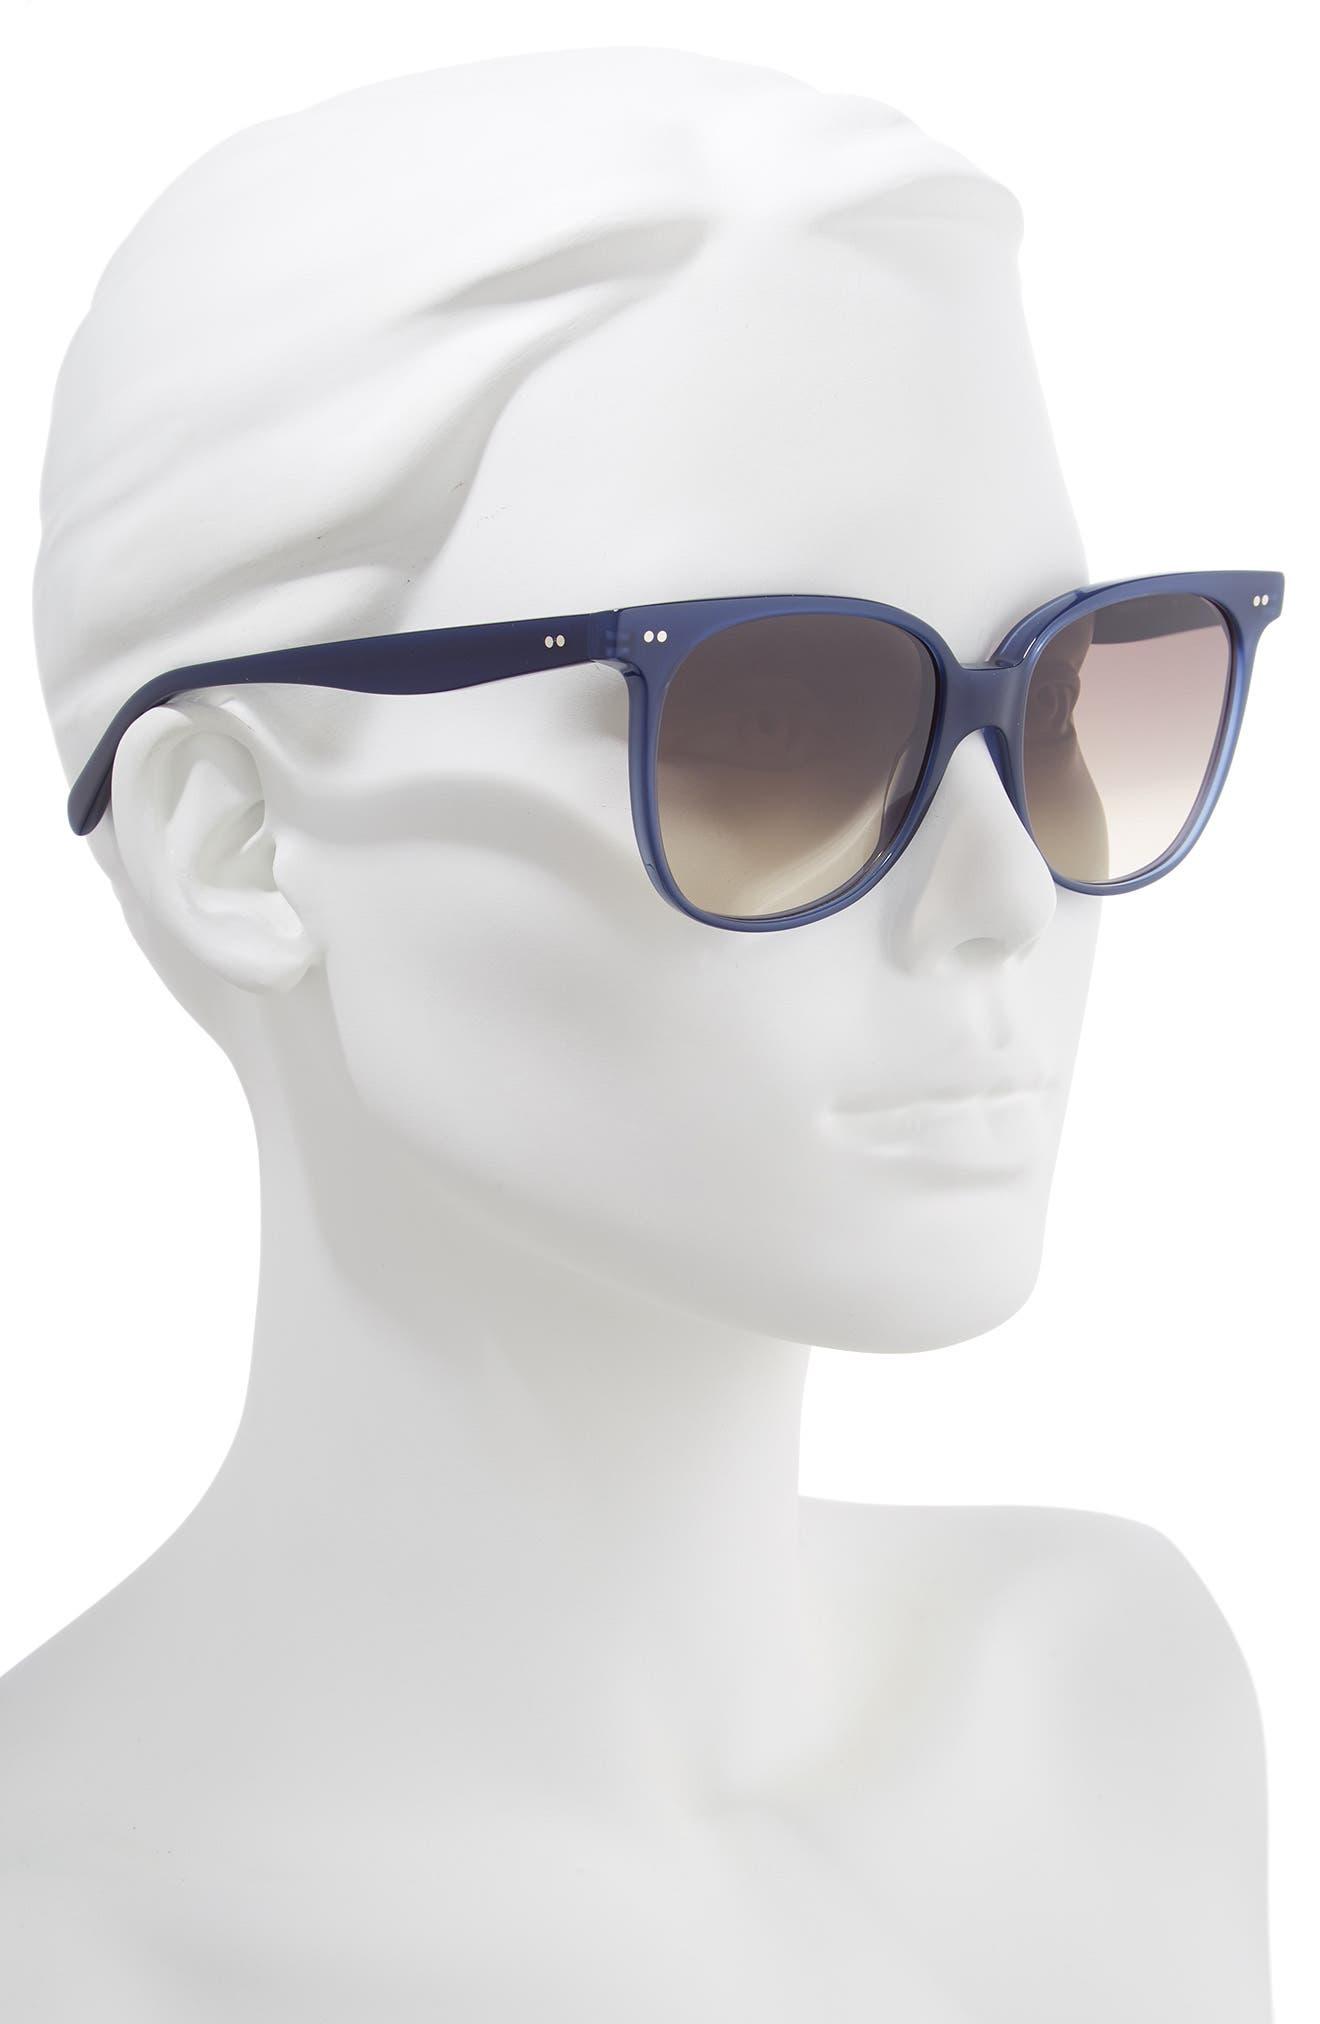 57mm Round Sunglasses,                             Alternate thumbnail 2, color,                             BLUE/ BROWN GRADIENT